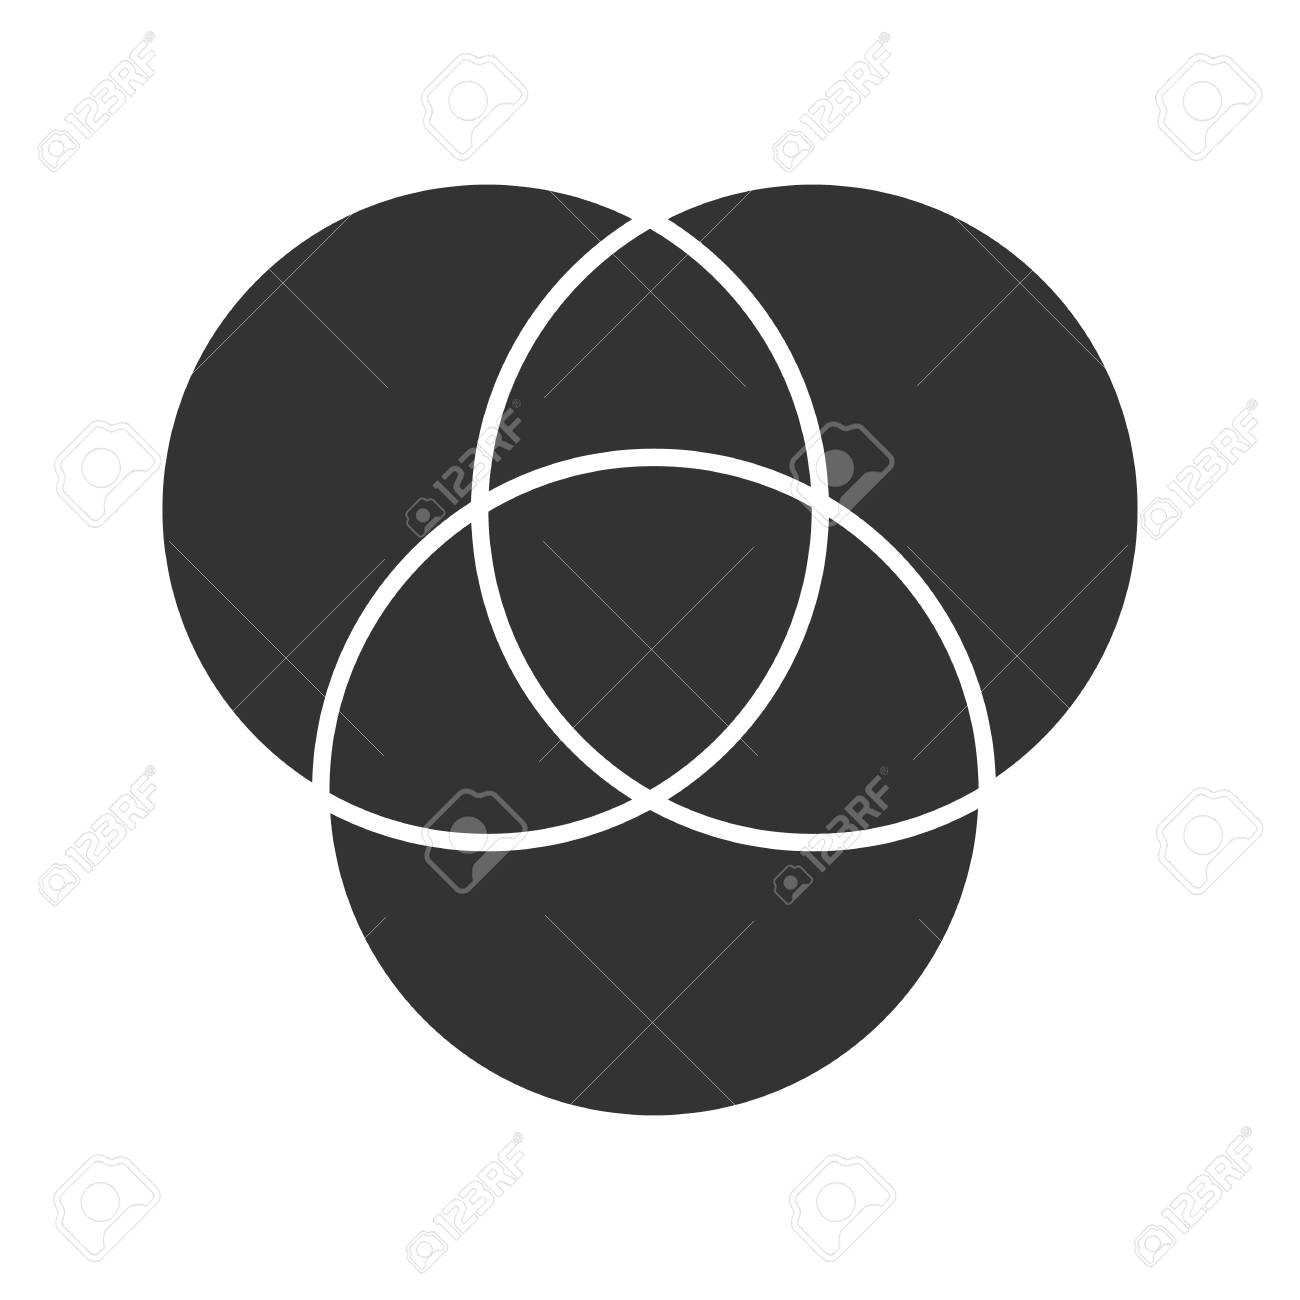 cmyk or rgb color circles glyph icon  silhouette symbol  venn diagram   overlapping circles